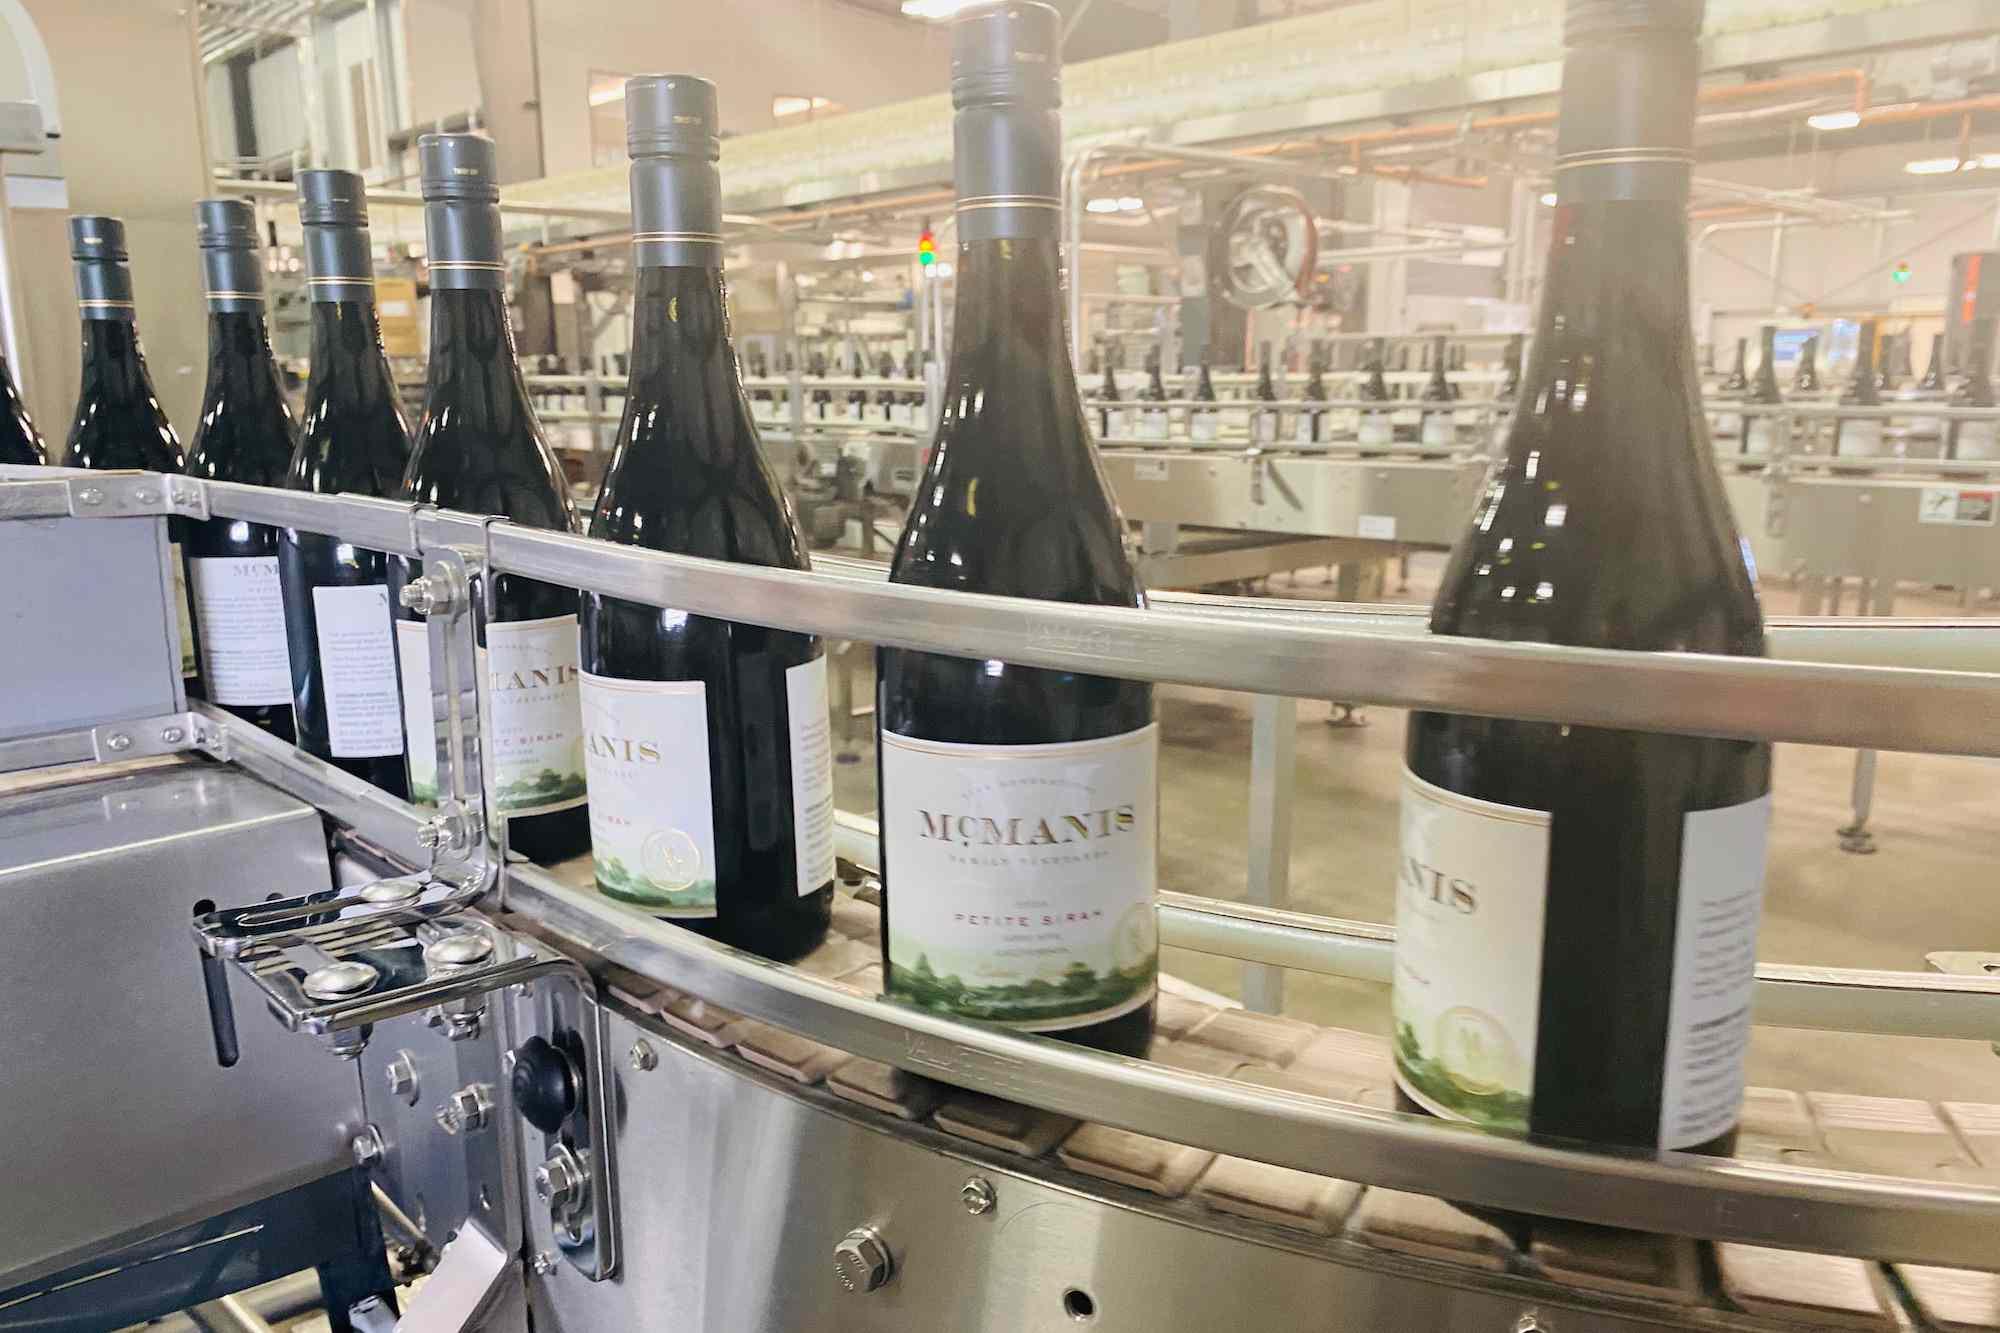 McManis winery